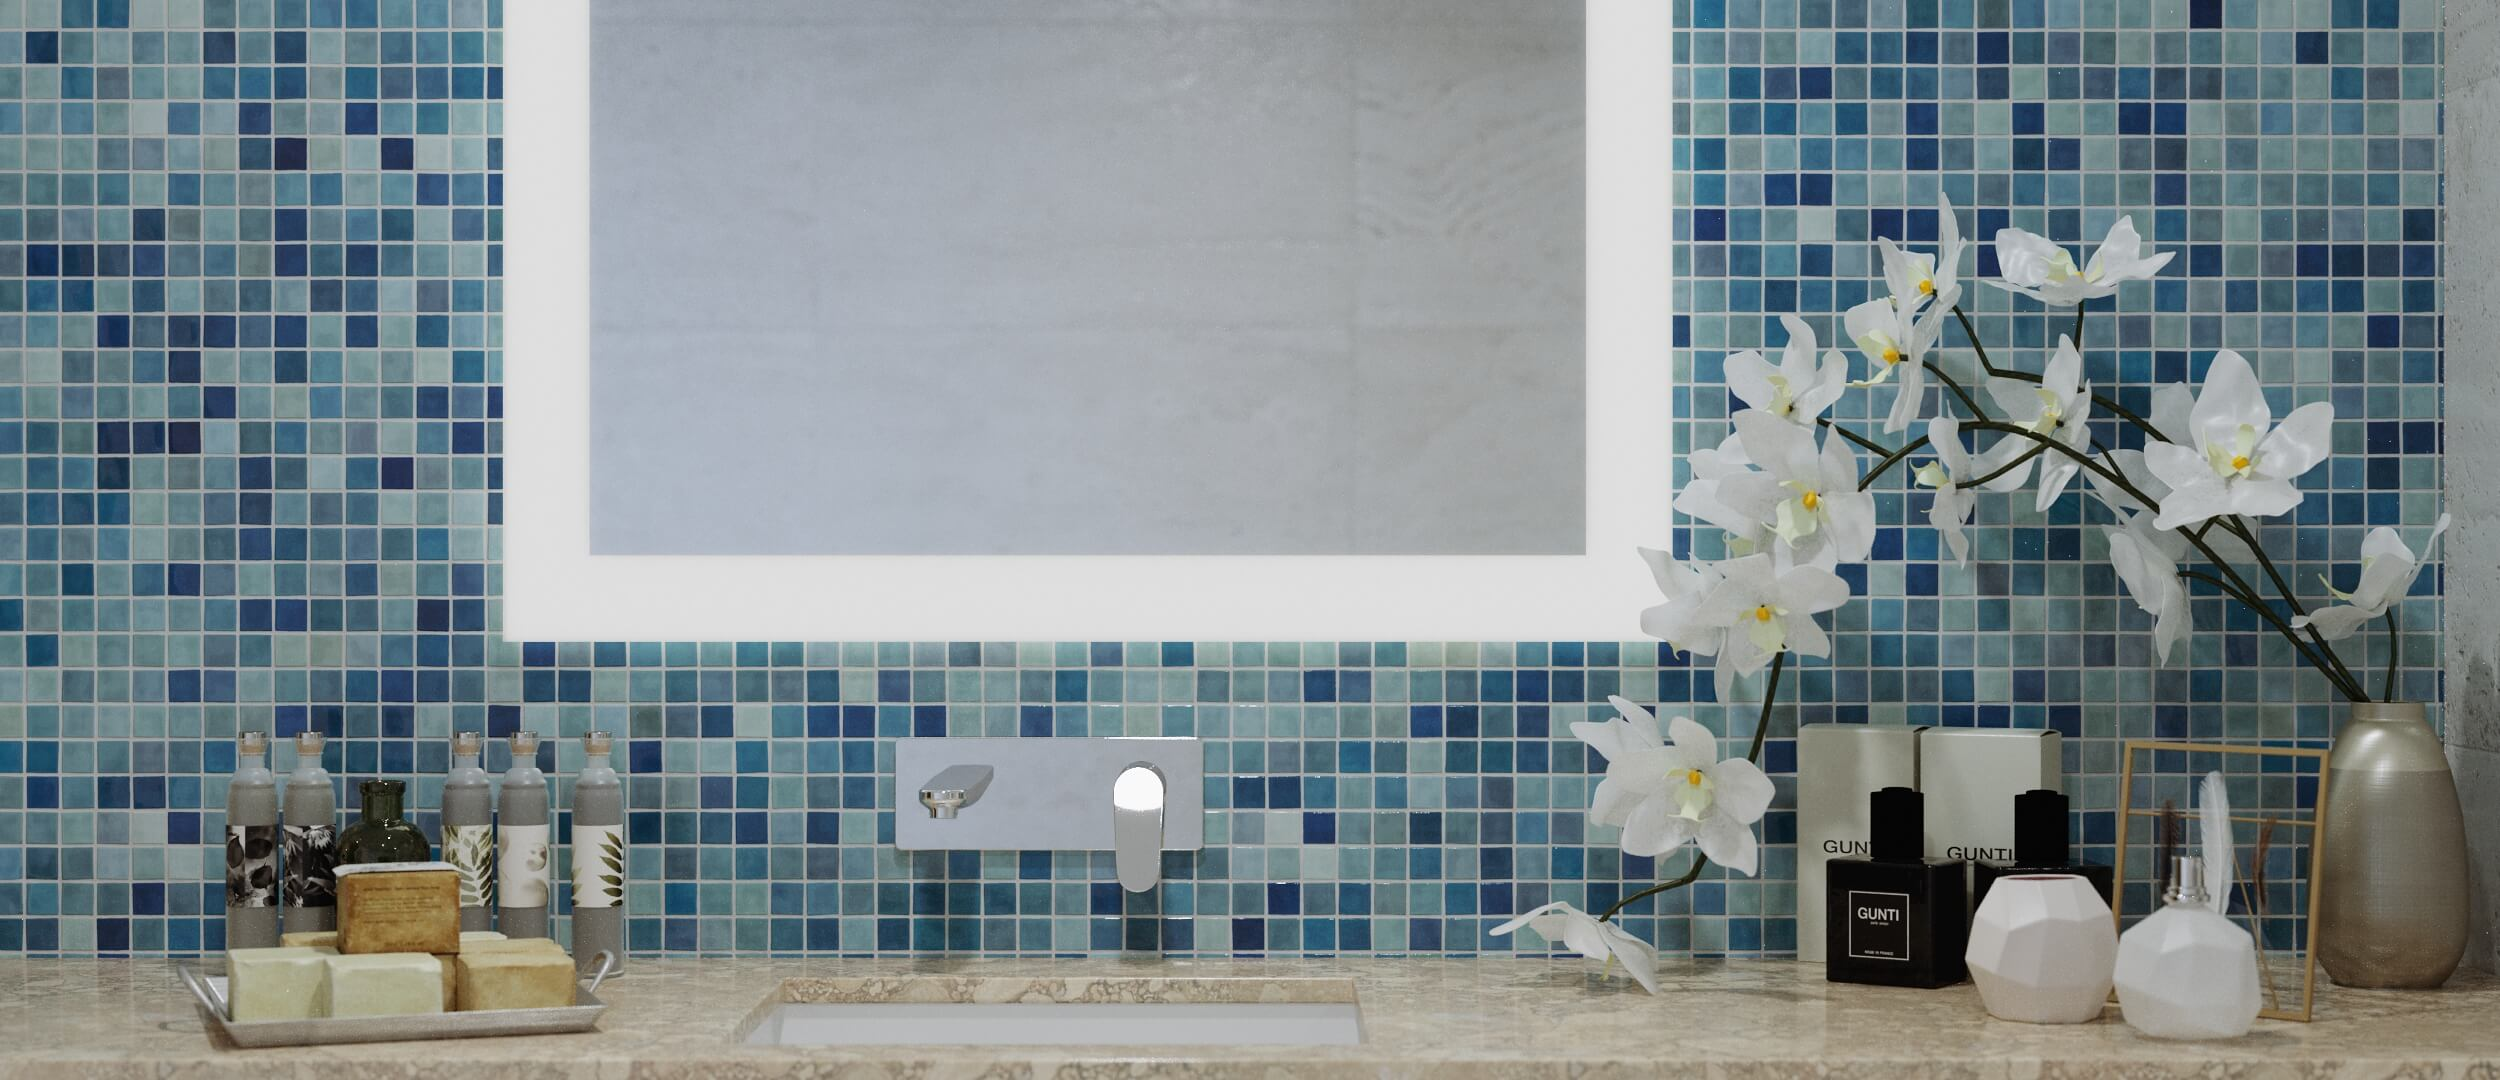 Bathroom mirror with LED light in mosaic bathroom